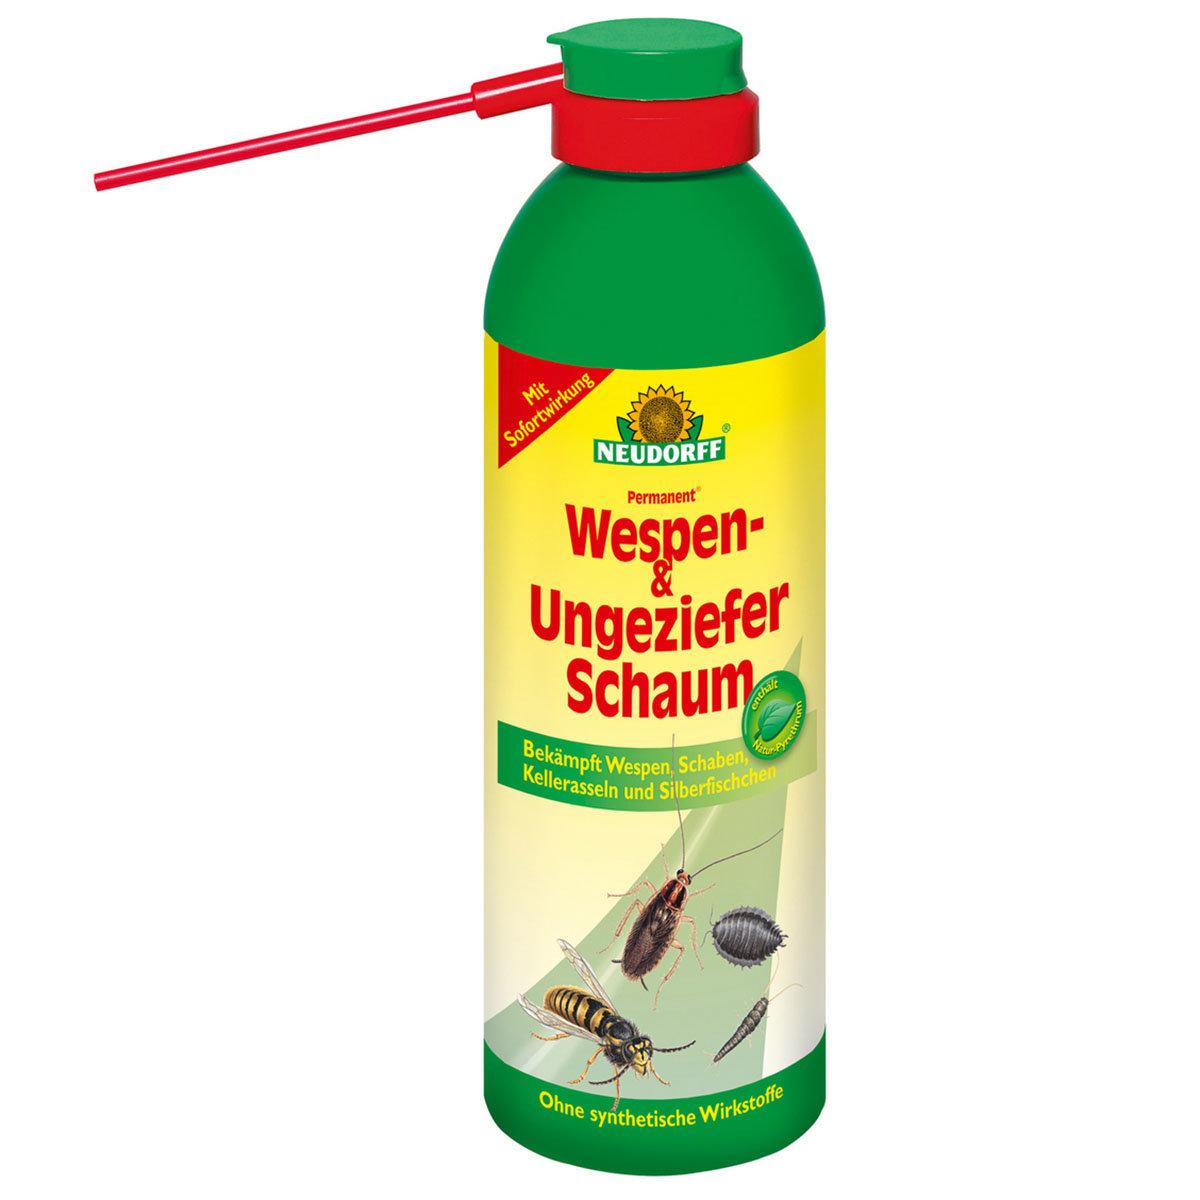 Permanent® Wespen & Ungeziefer Schaum